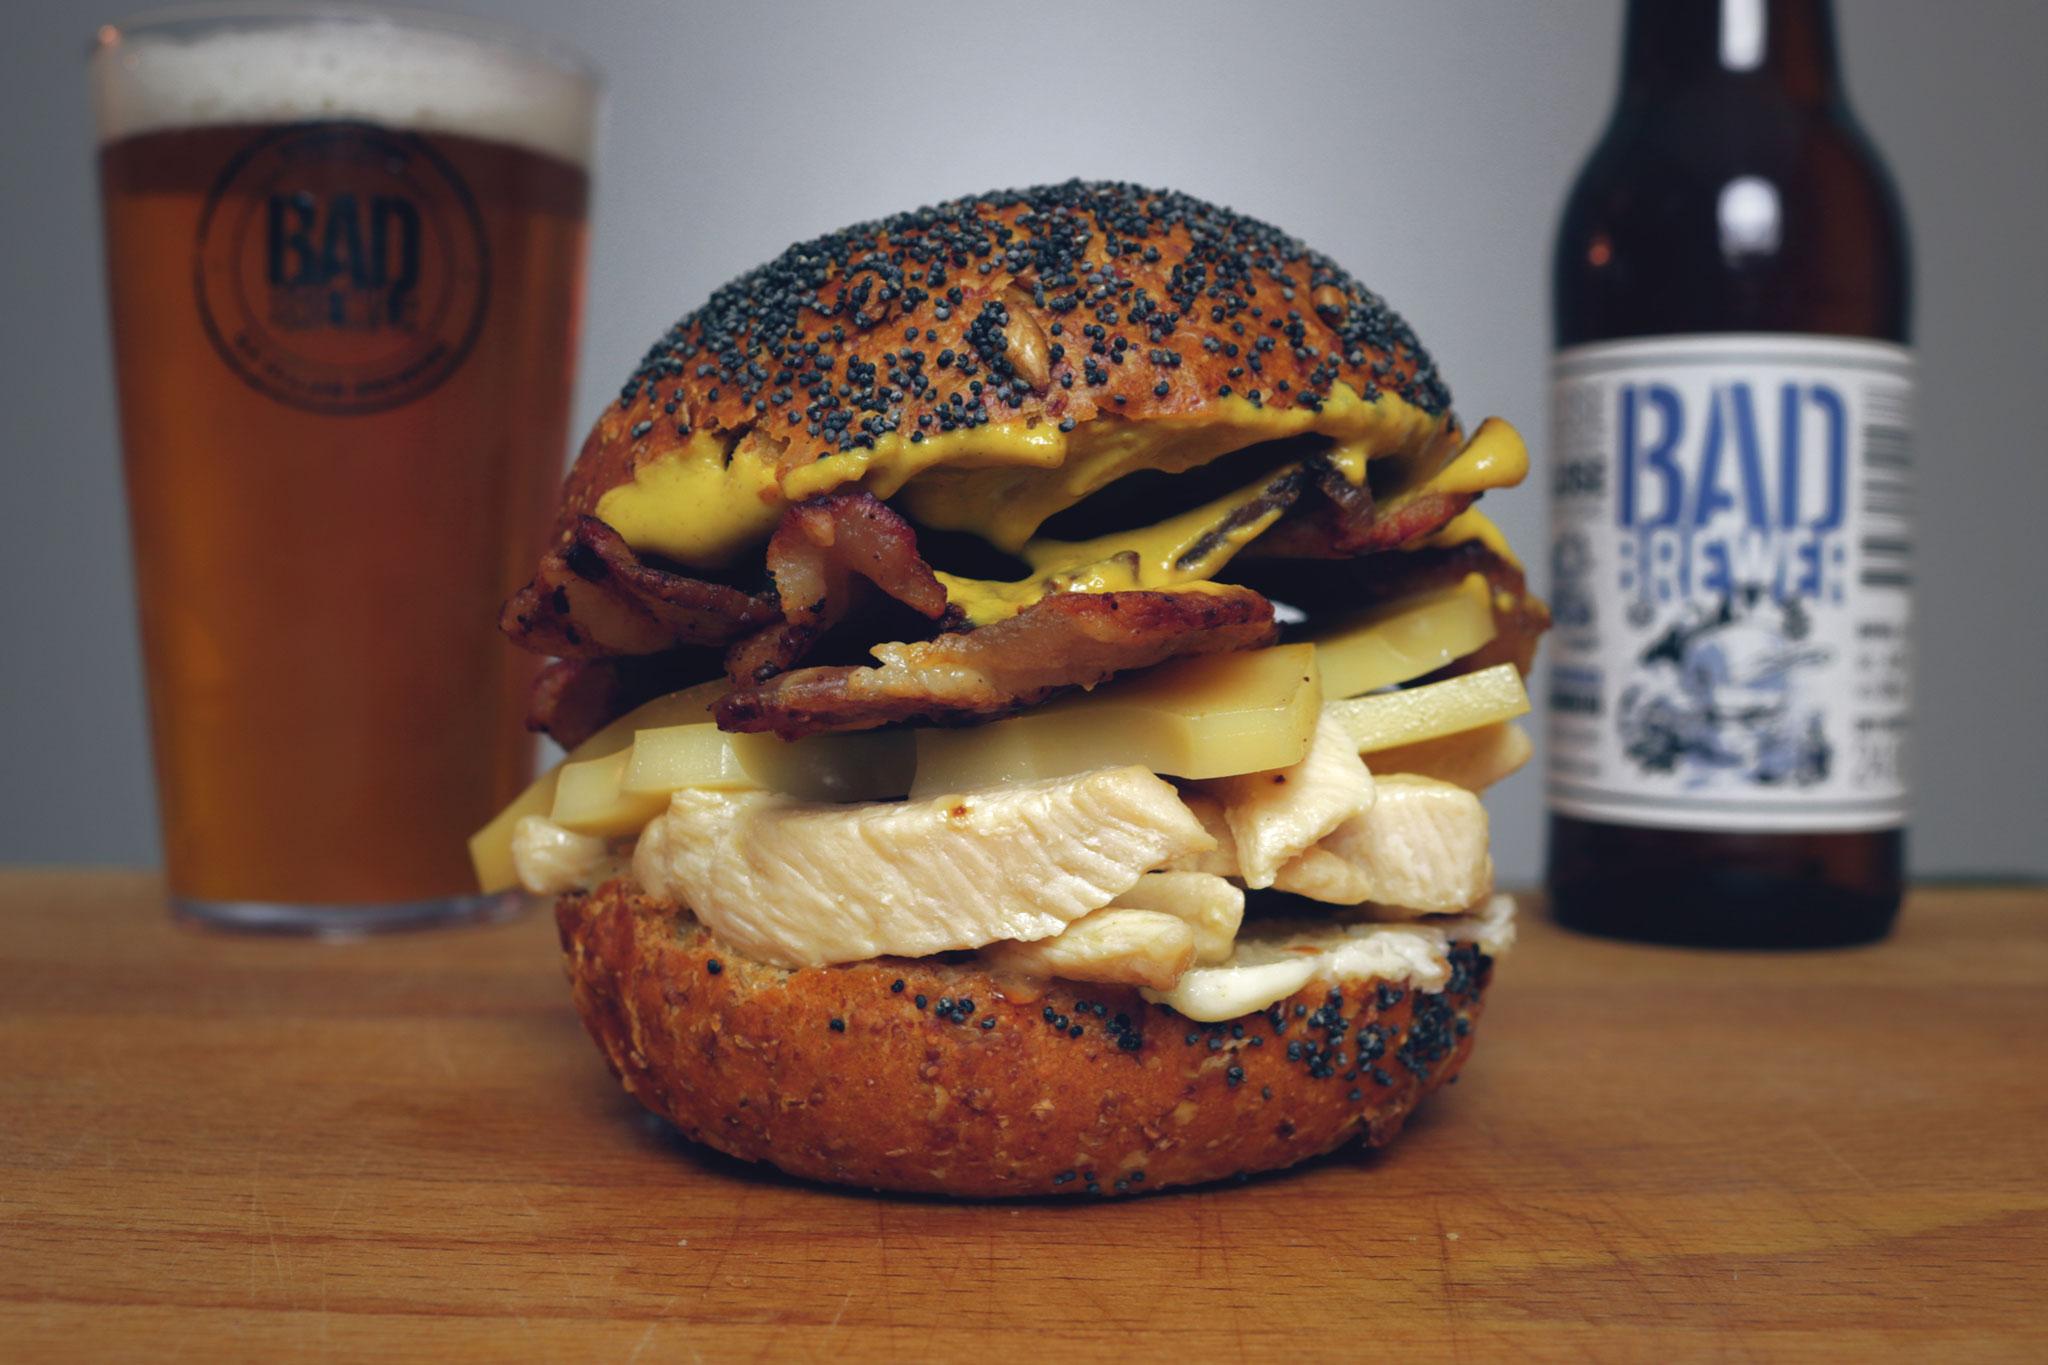 badbrewer-3-chicken-bacon-low.jpg